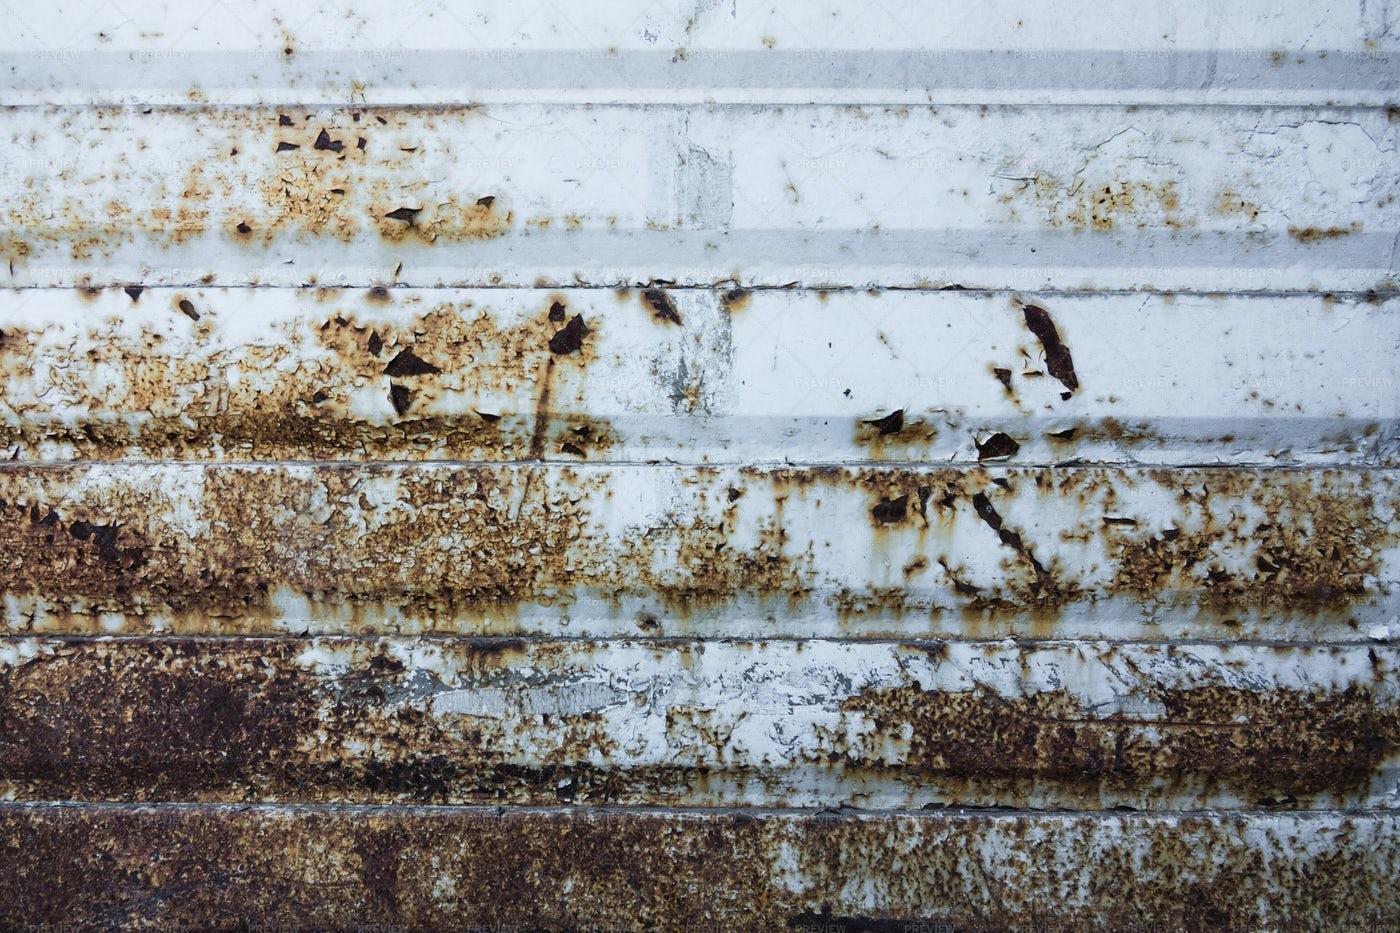 Texture Of Rusty Iron Wall: Stock Photos